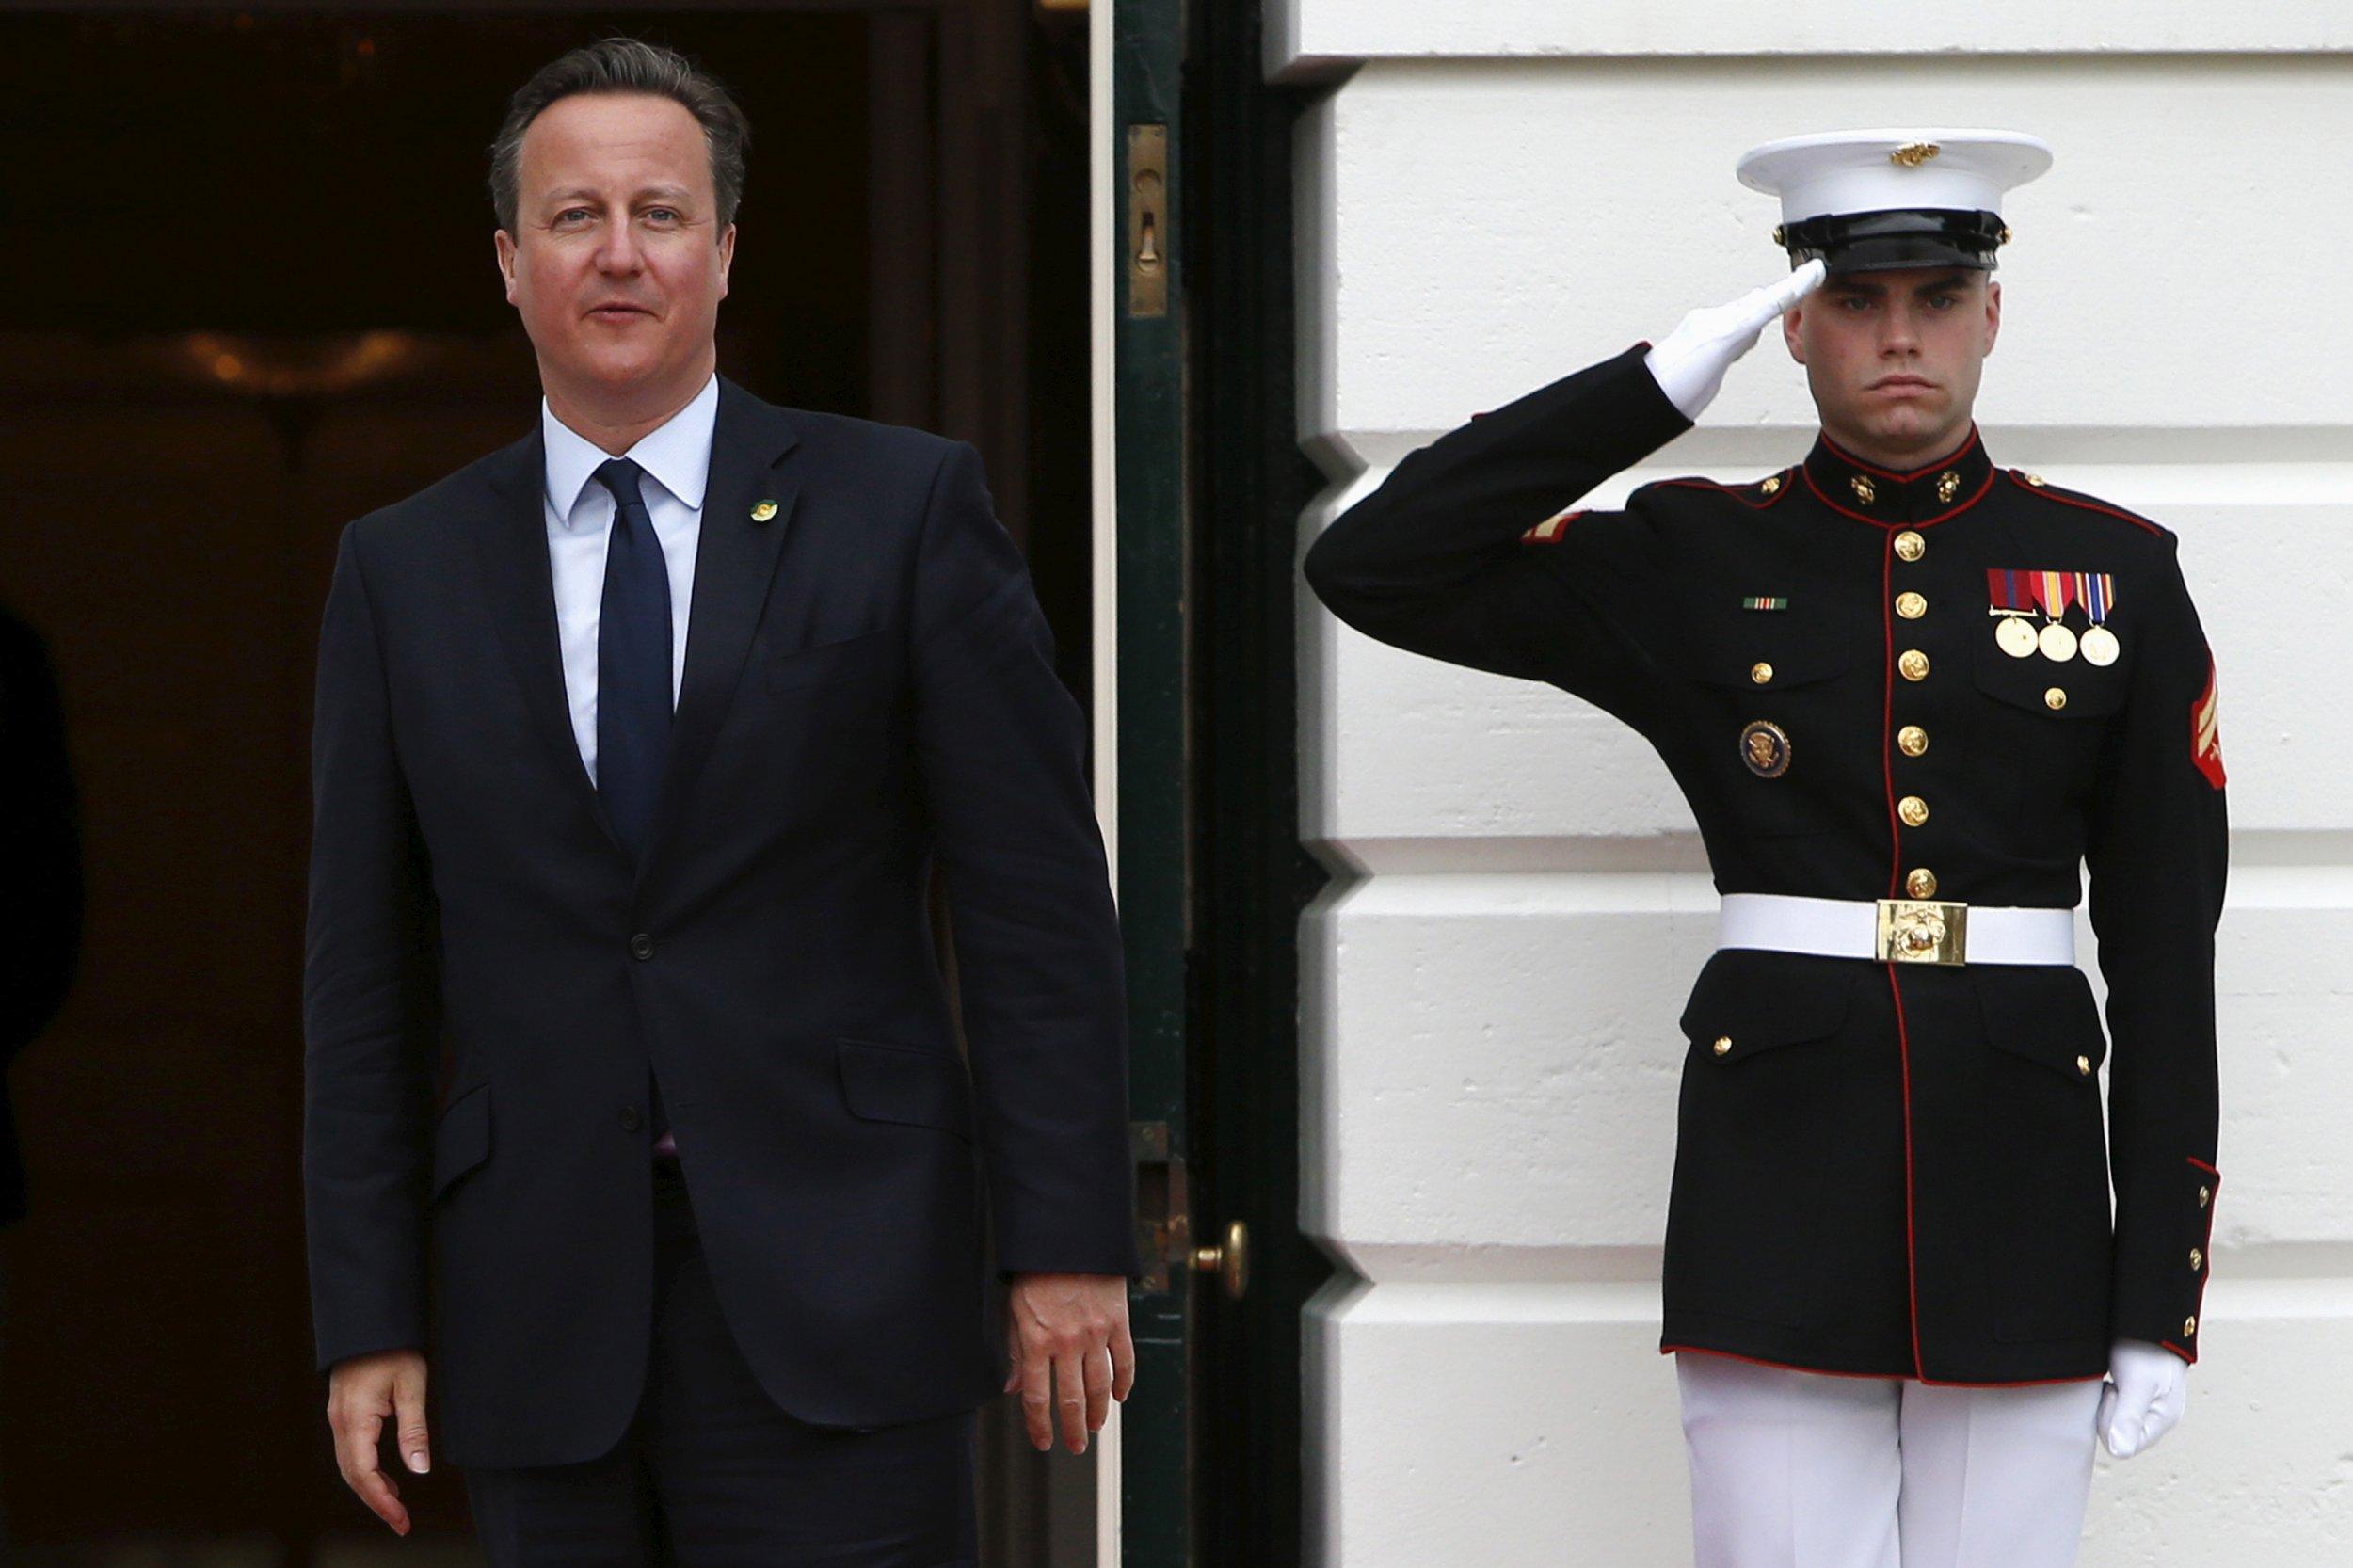 David Cameron at the White House